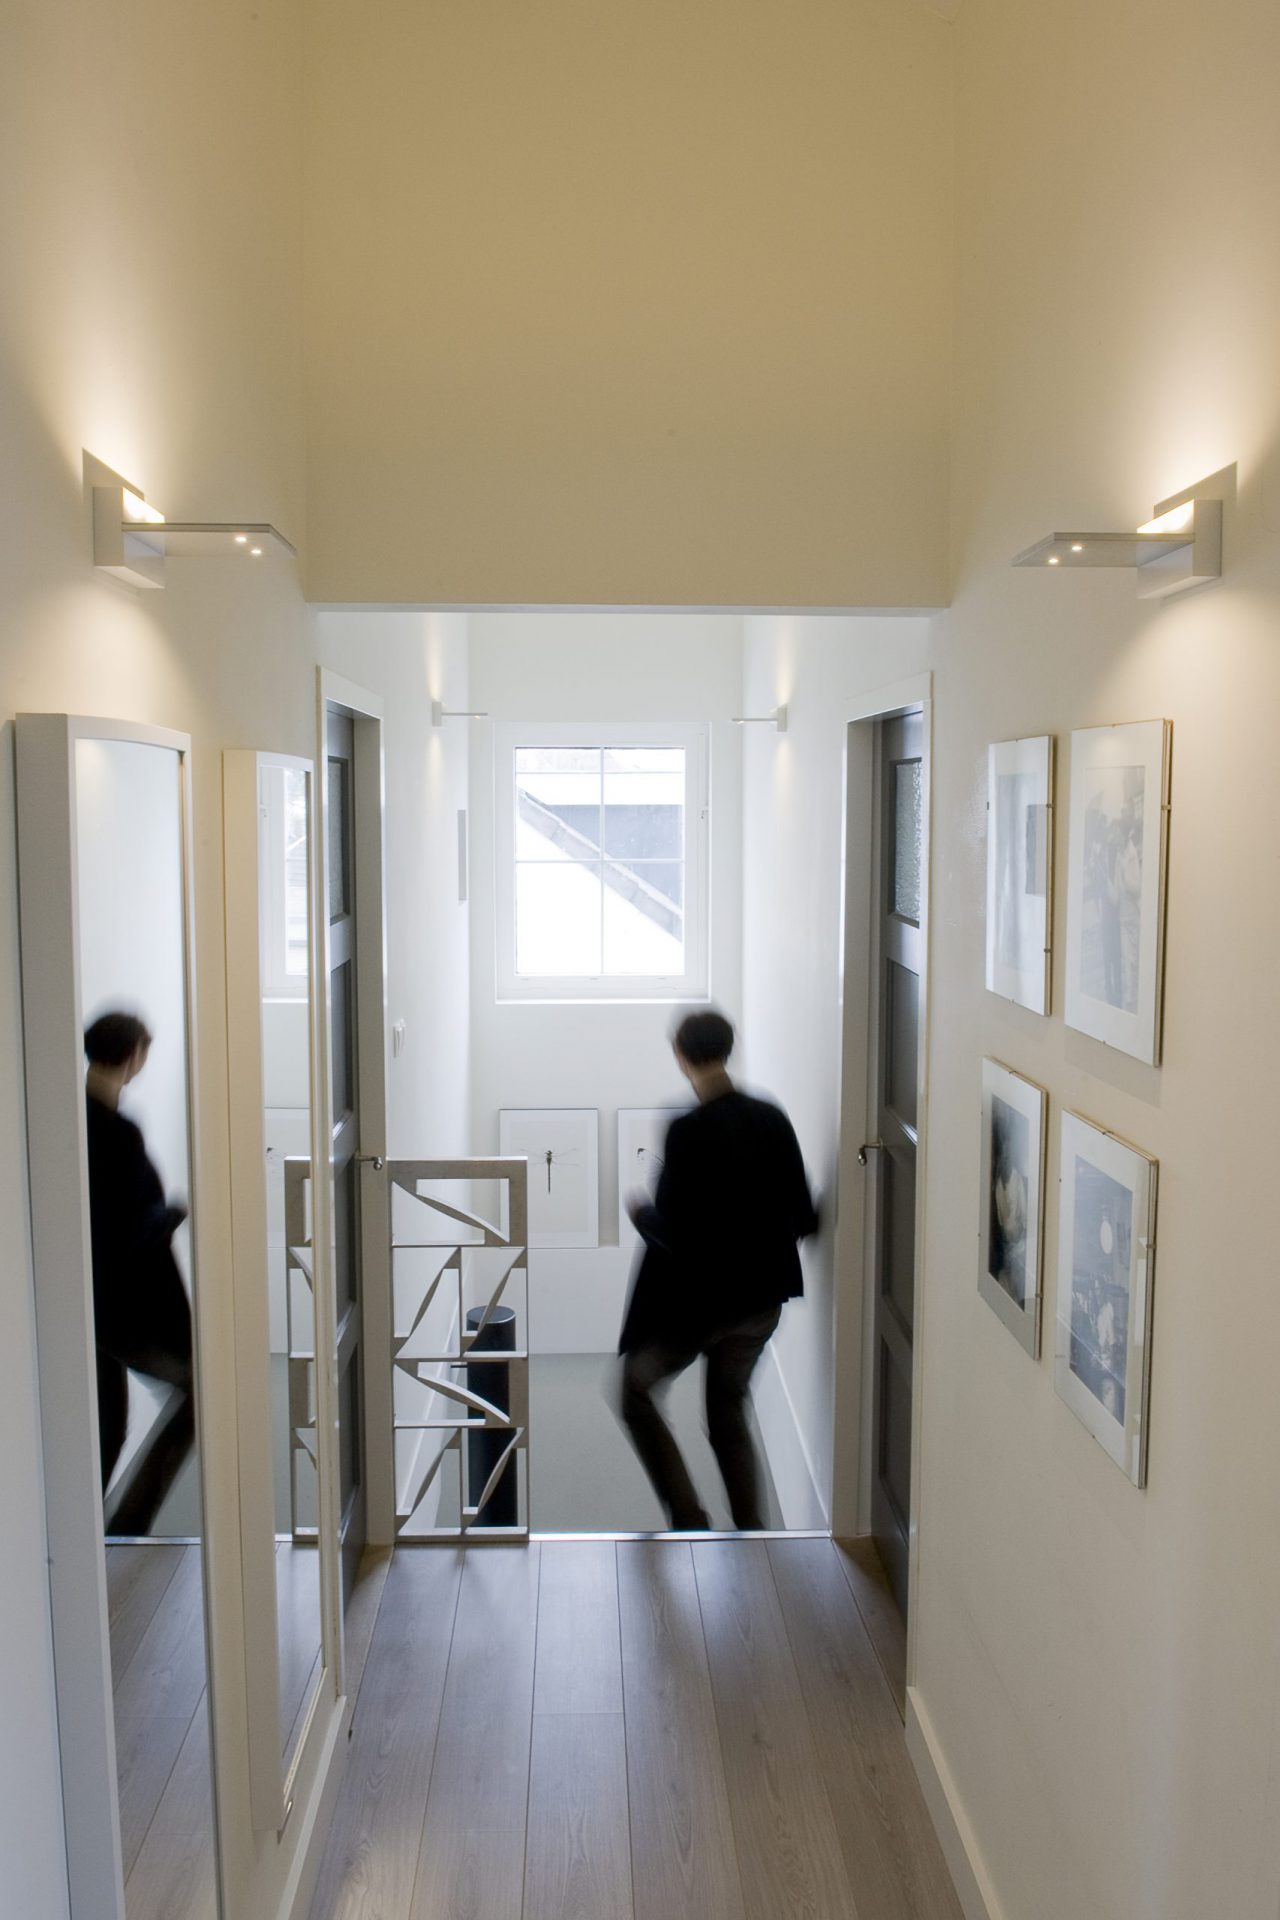 PIXEL Wall Basic FERROLIGHT in de gang   Hoogebeen Interieur